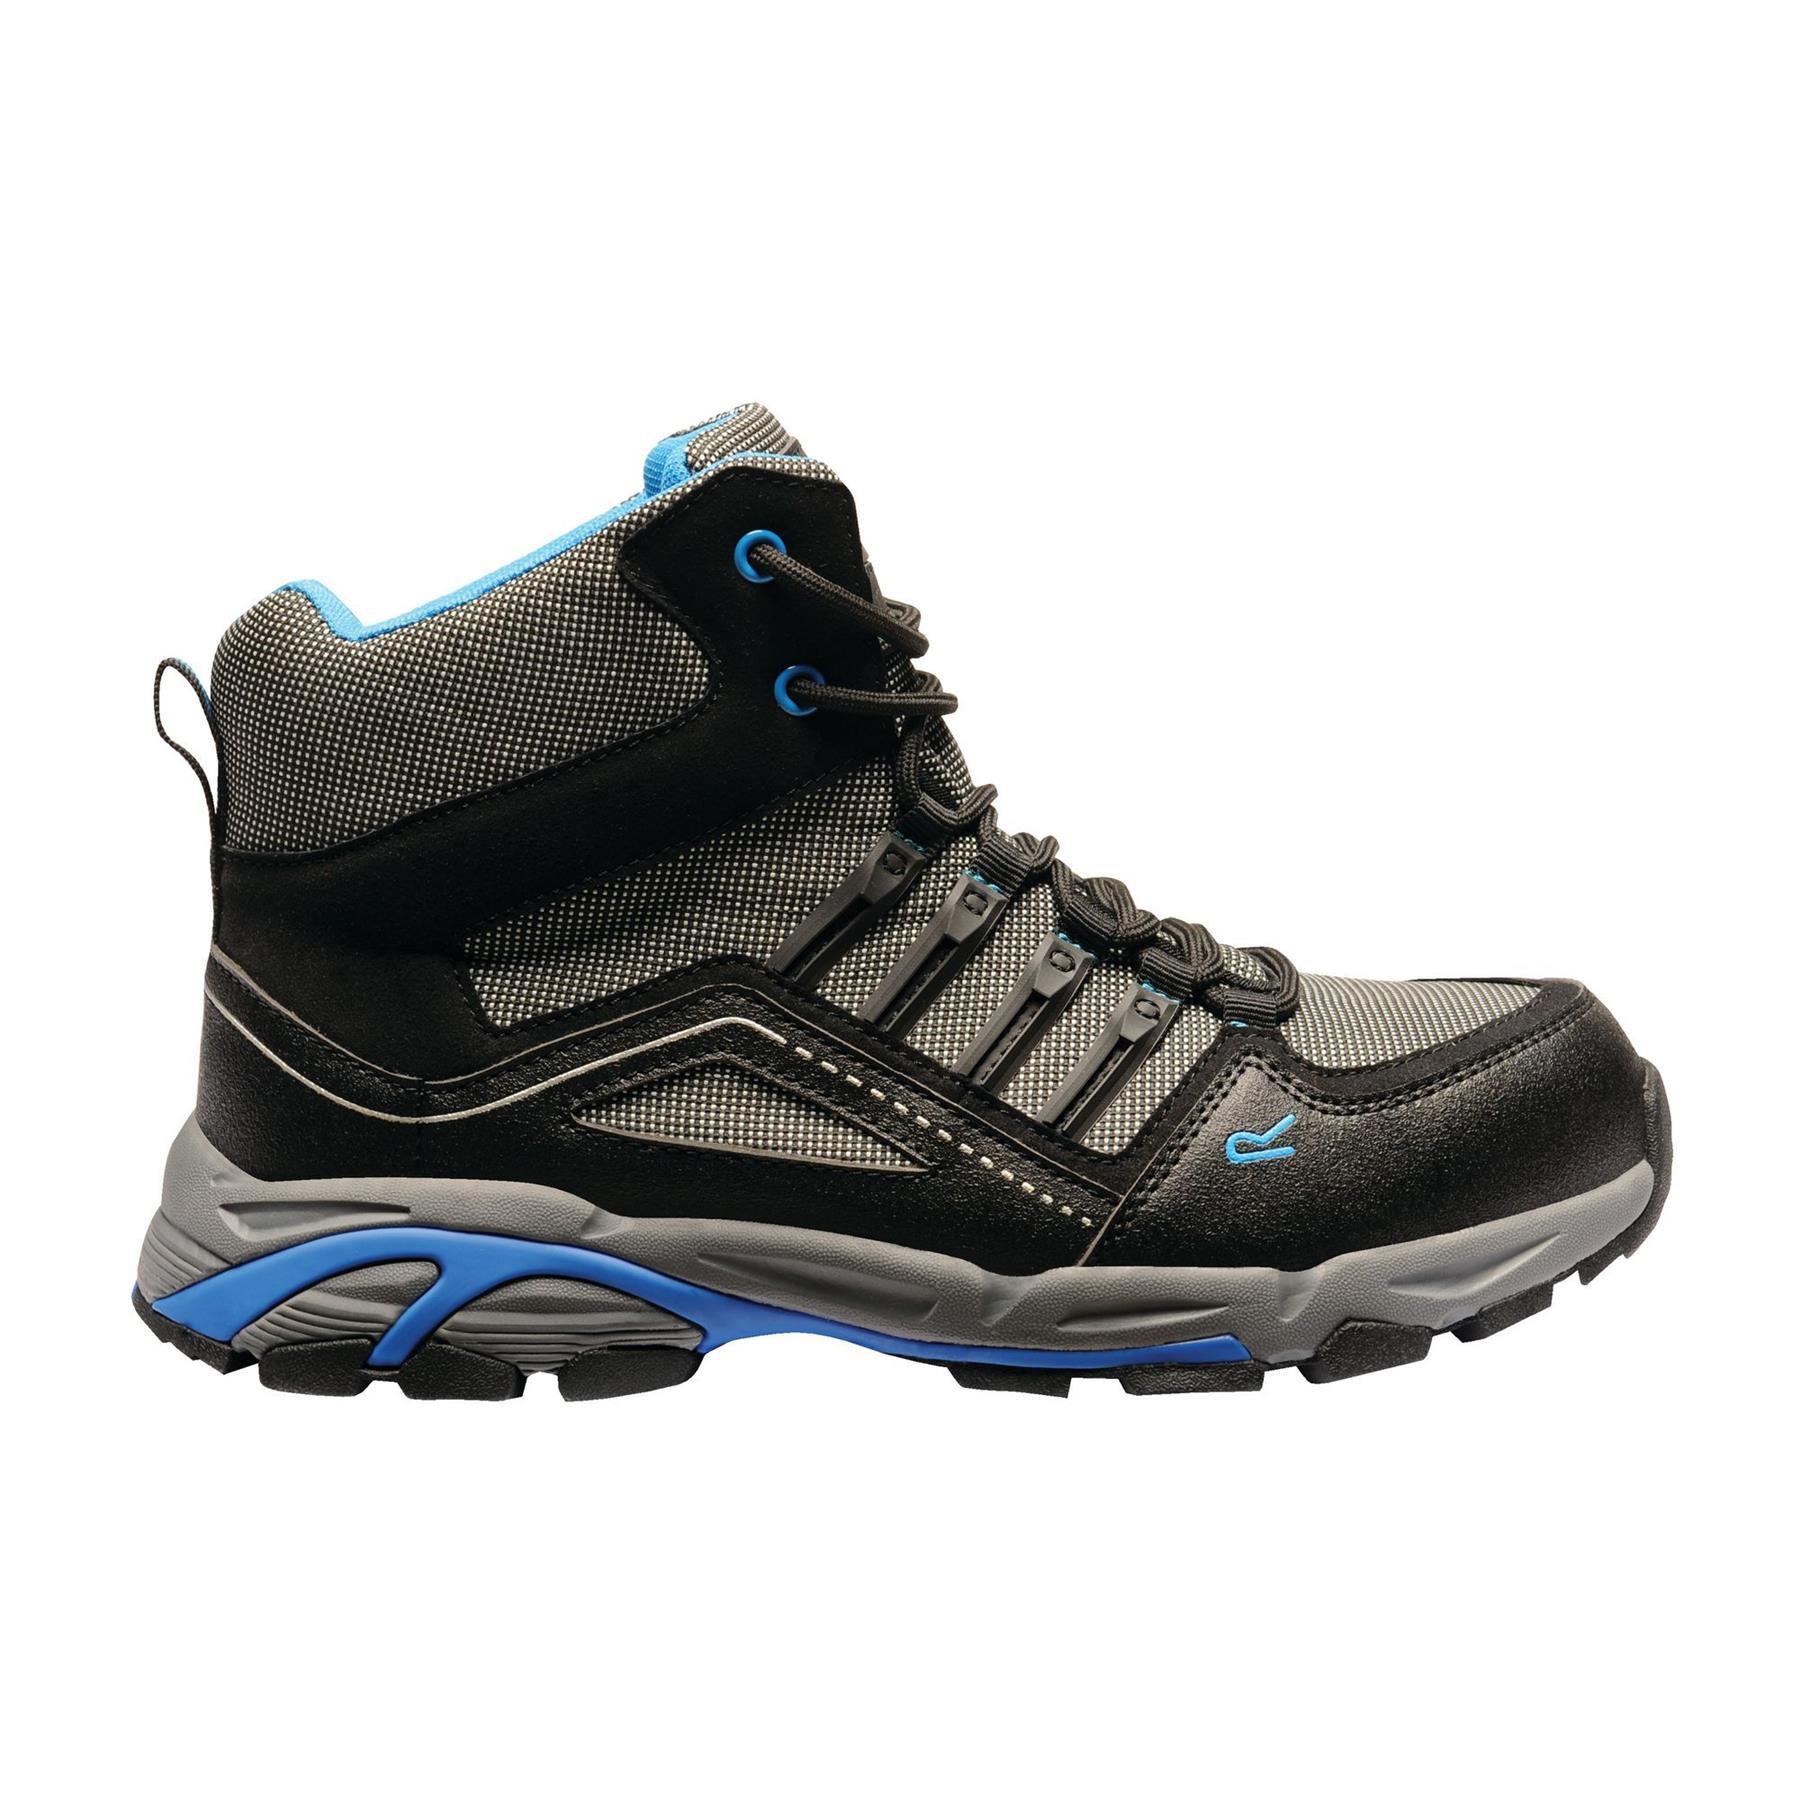 miniatuur 4 - Regatta Mens Work Safety Protective Shoes Steel Toe Cap Boots Workwear